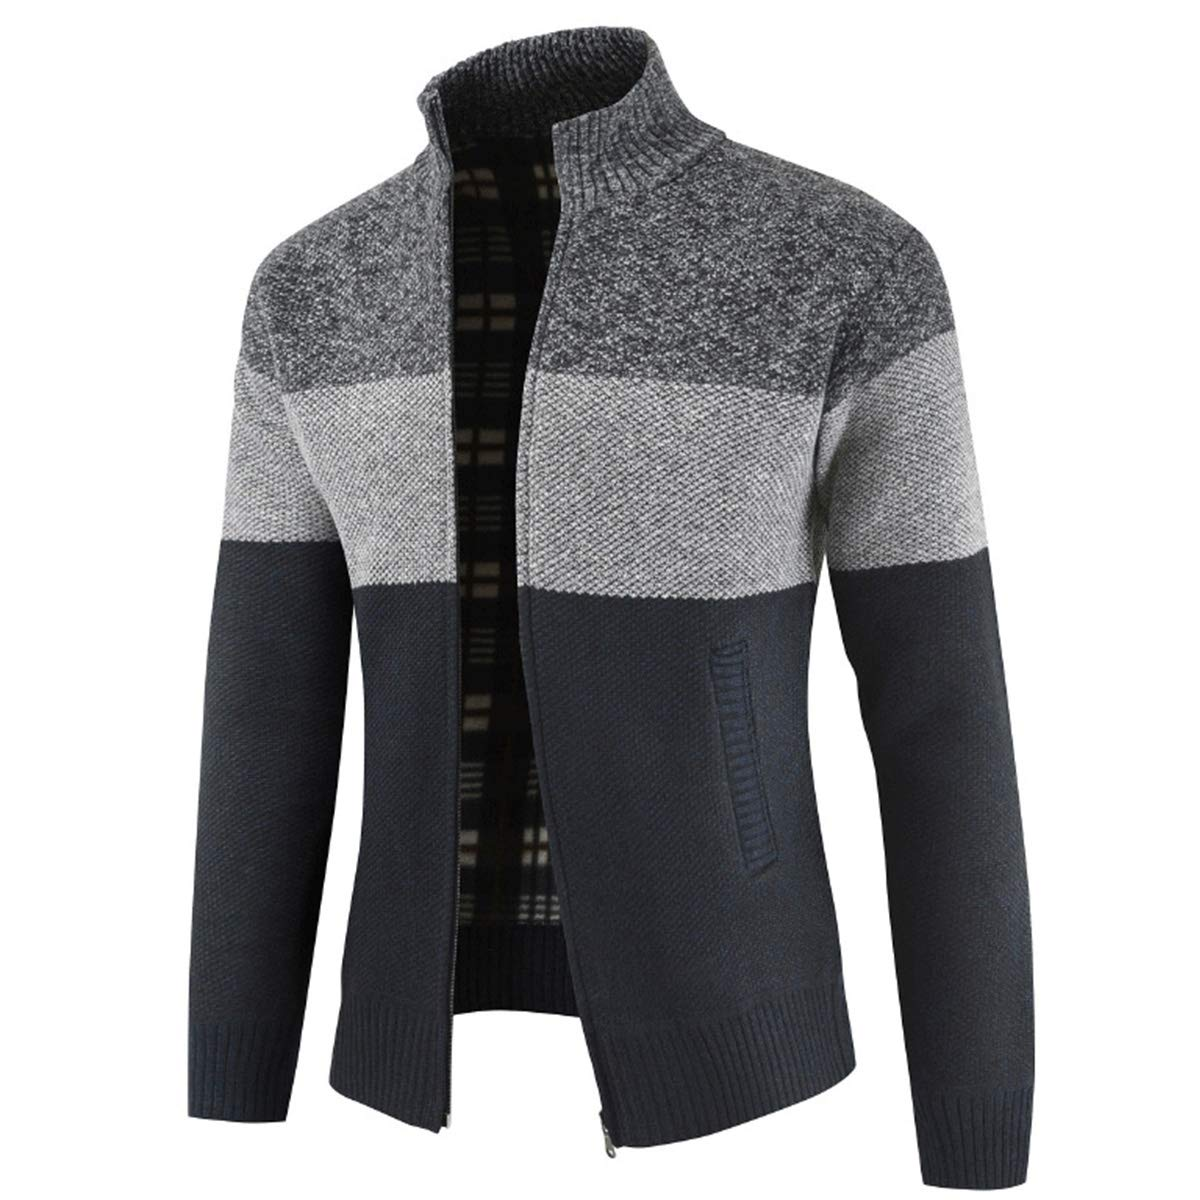 Mens Riverton 'Fleece Lined' Zip Up Cardigan Jumper Sweater Warm Winter Jacket